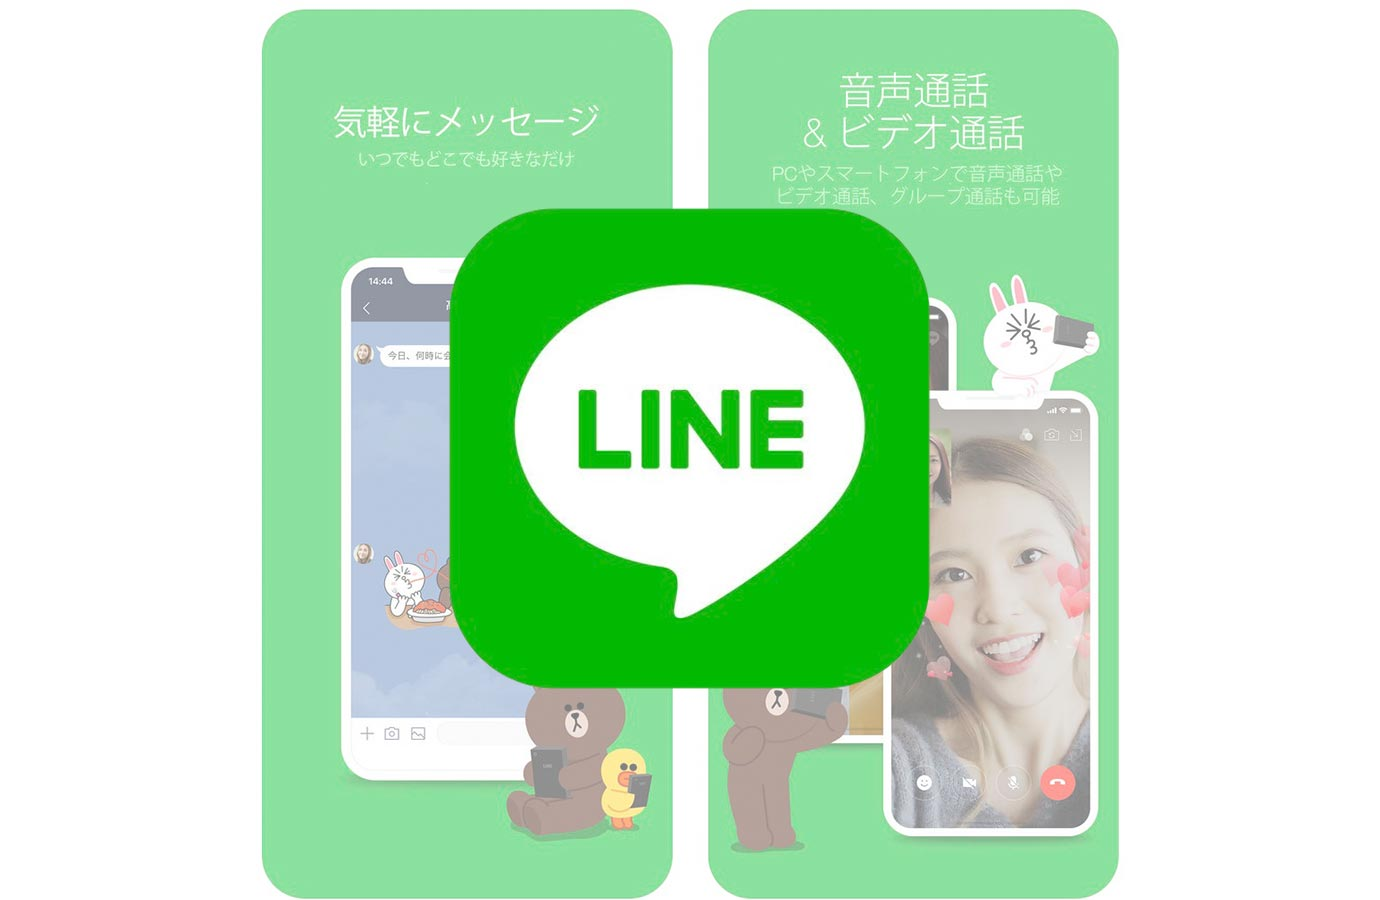 LINE、iOSアプリ「LINE 8.18.1」リリース ー LINE QUICK GAMEの一部タイトルが近日中に復旧と案内